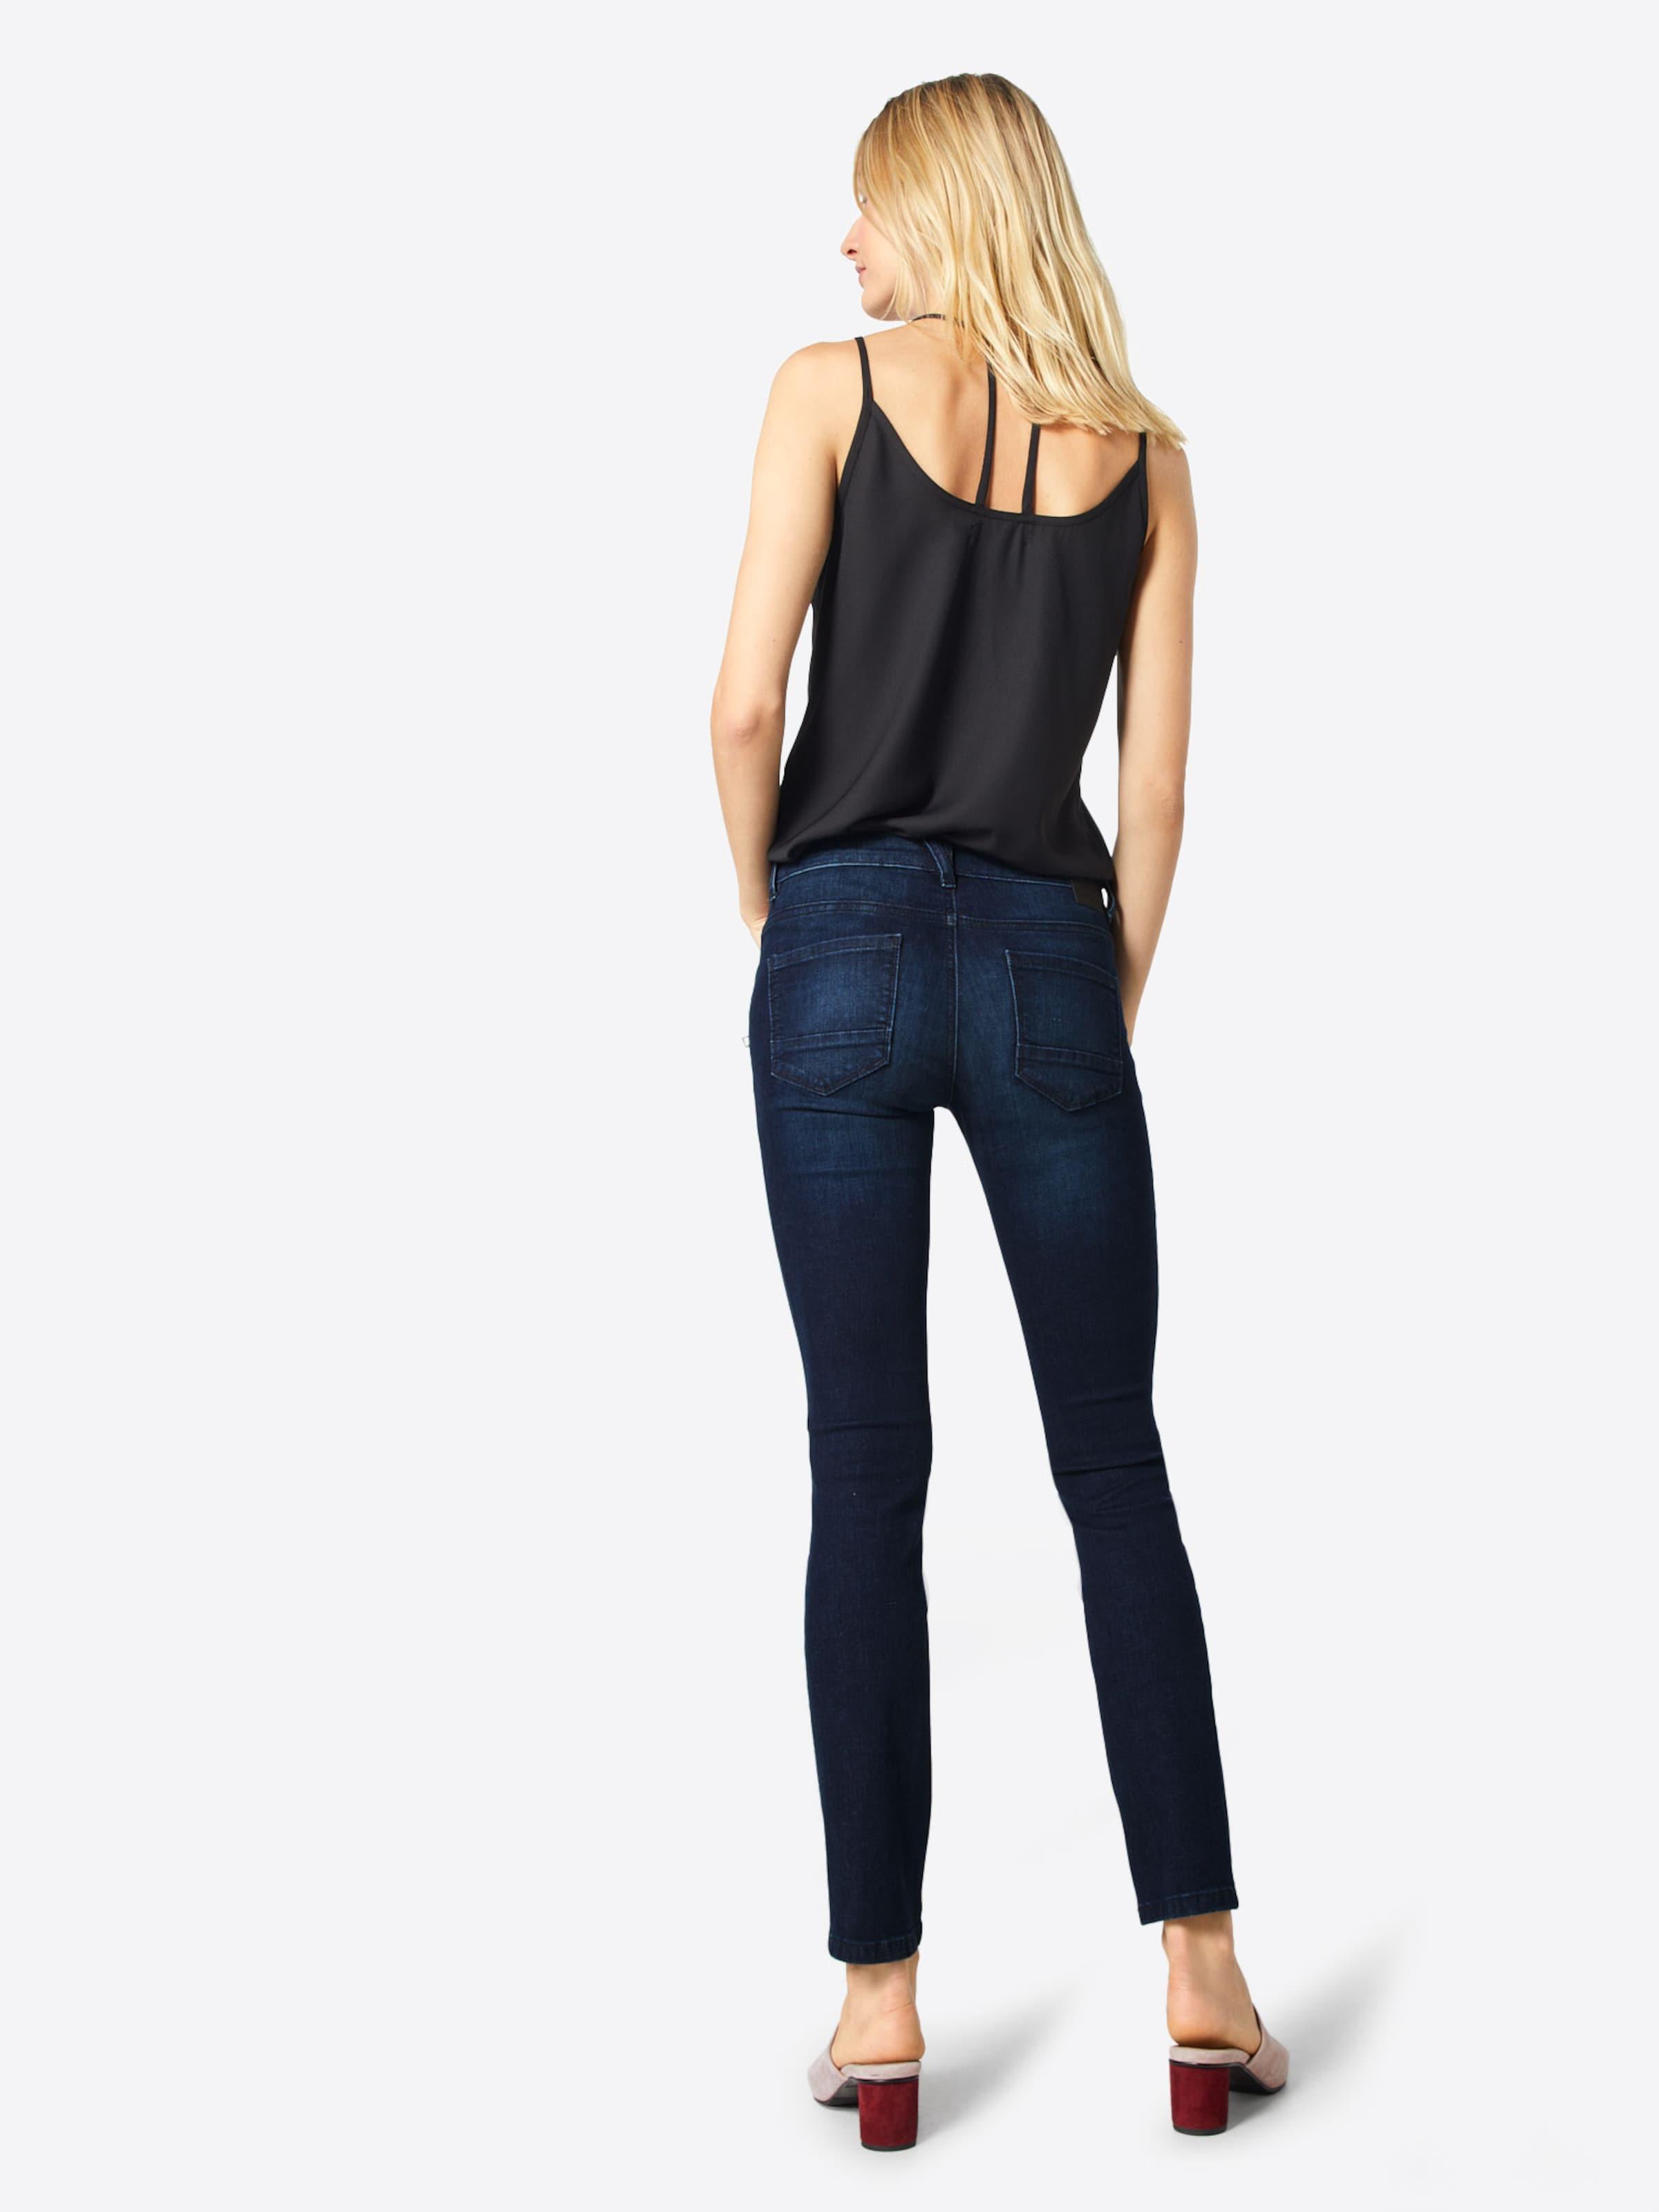 Blue In Jeans Tom Tailor Denim trQshd